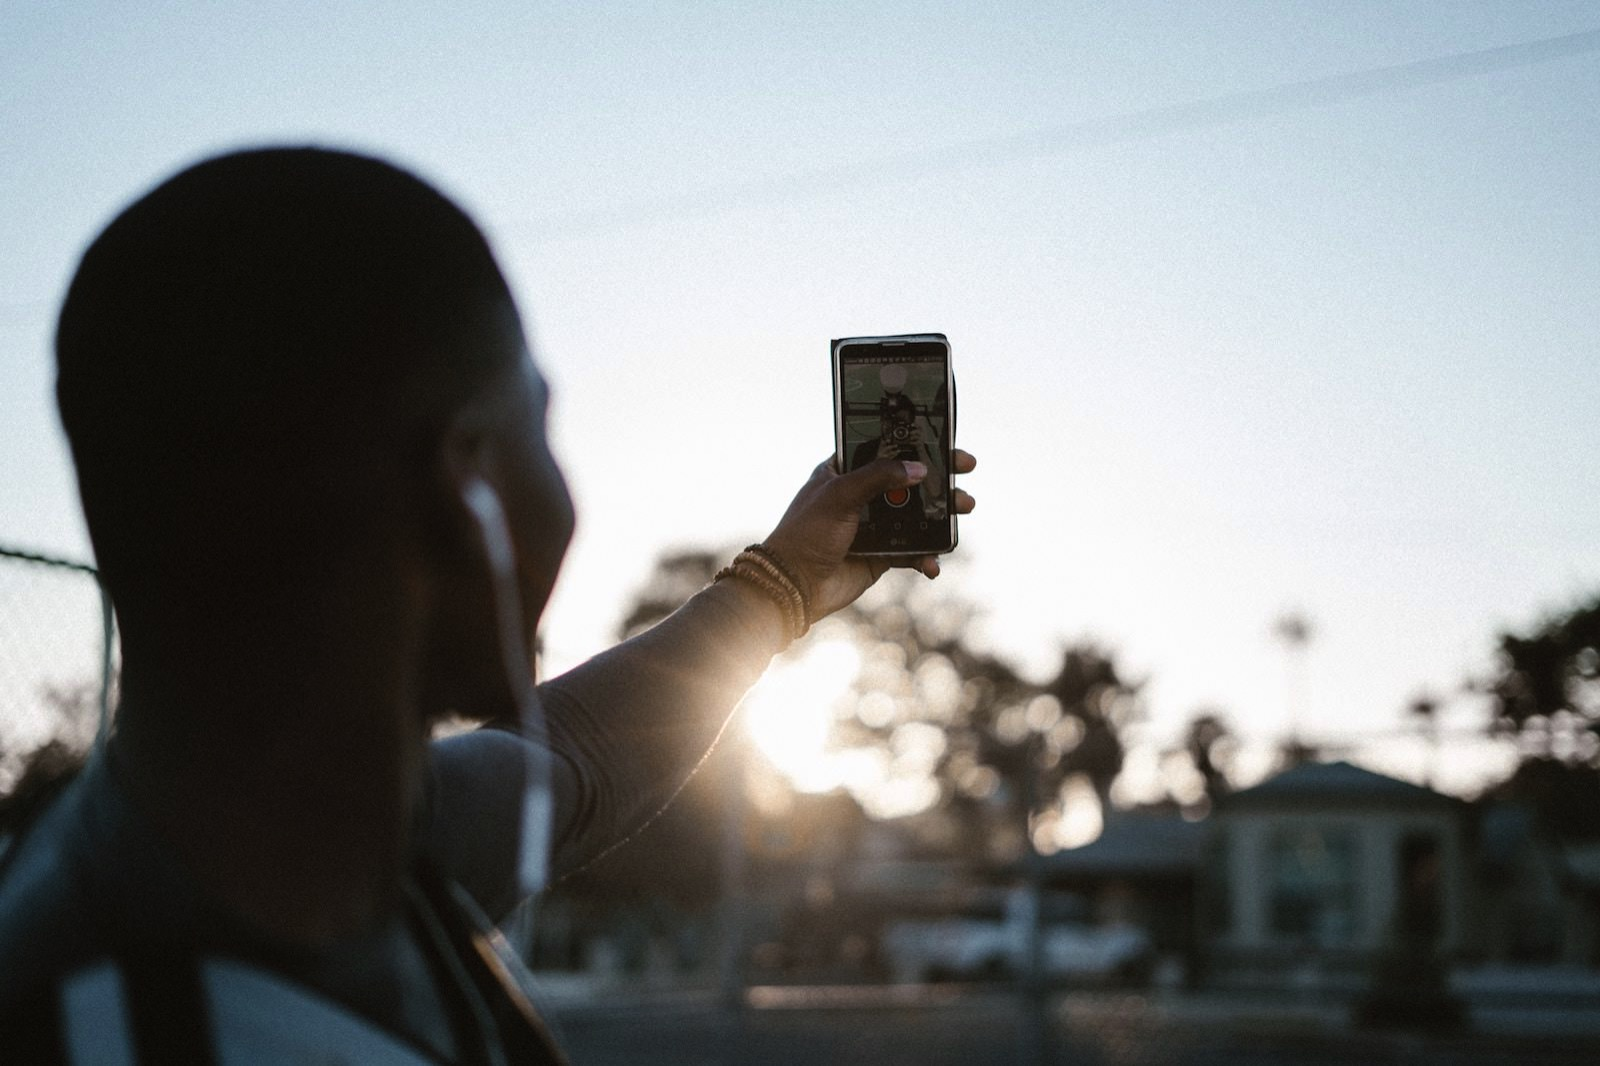 Levi elizaga 454770 unsplash taking a selfie